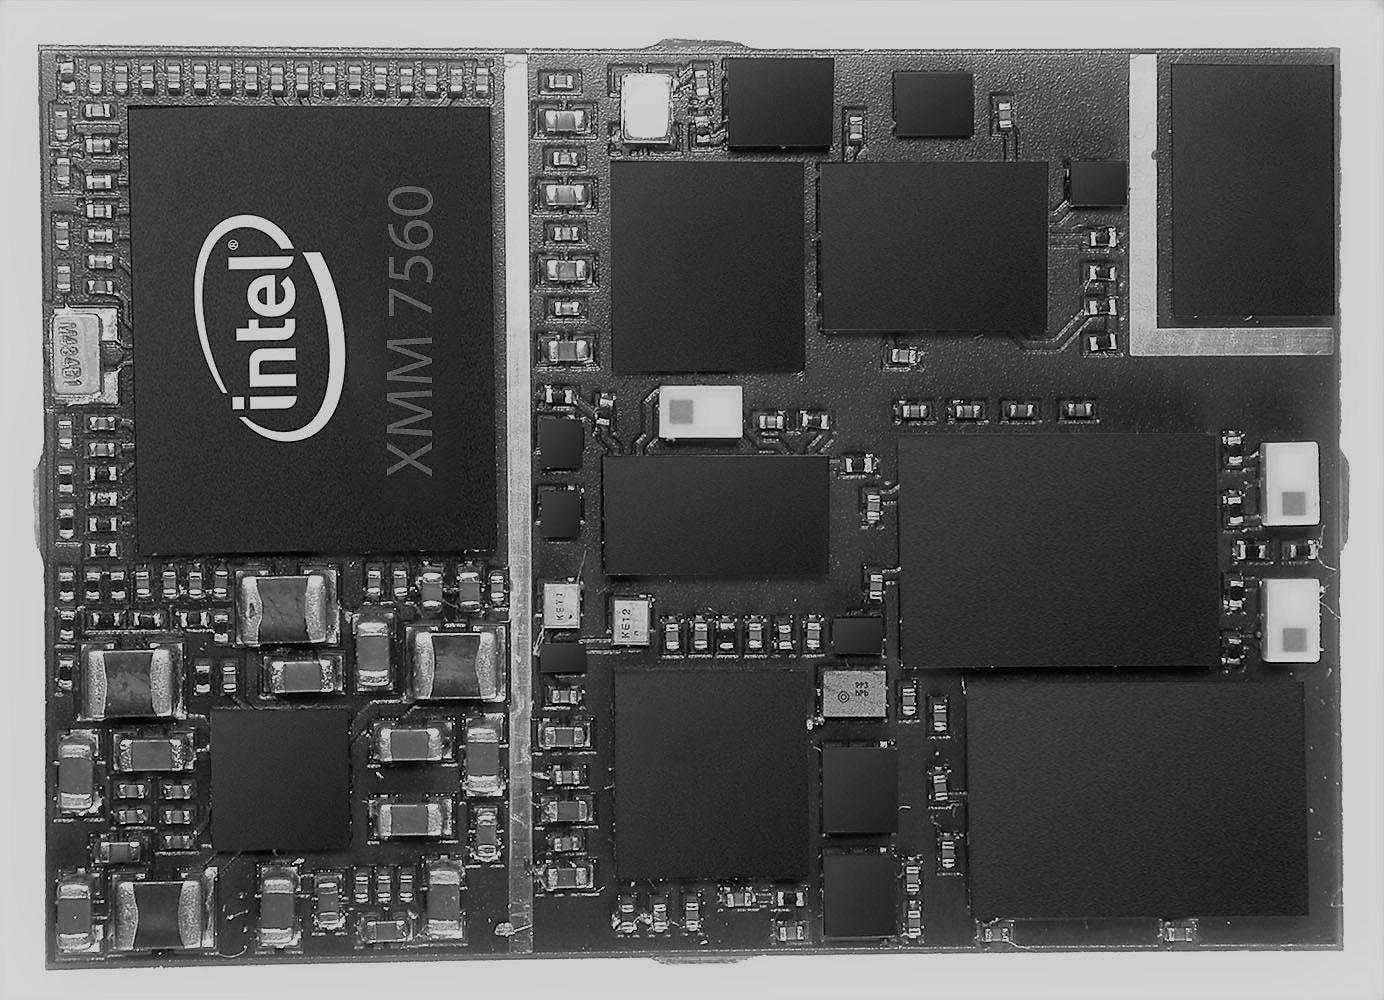 Modem XMM 7560, da Intel